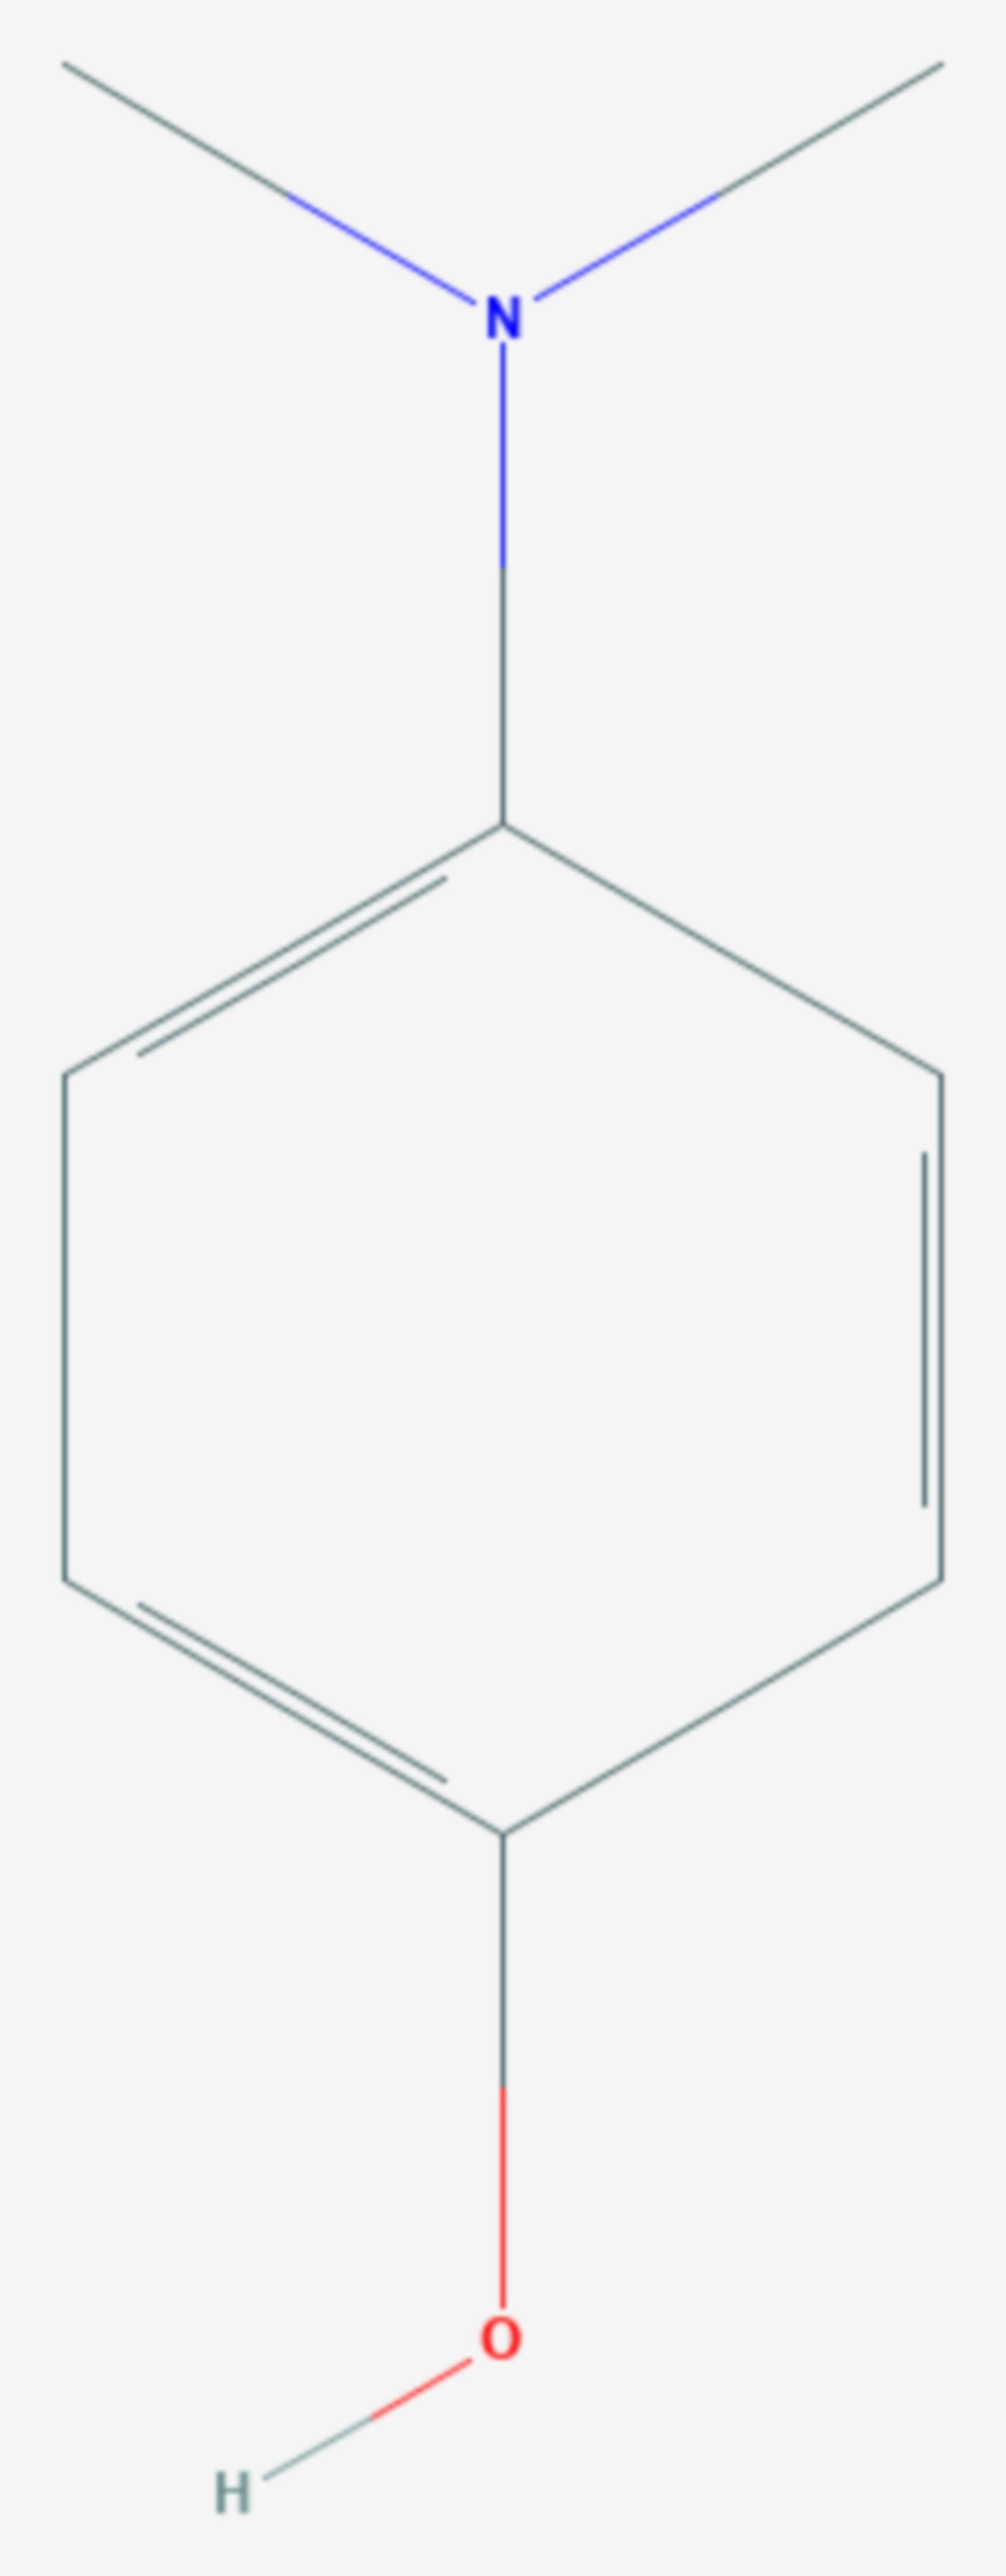 4-Dimethylaminophenol (Strukturformel)